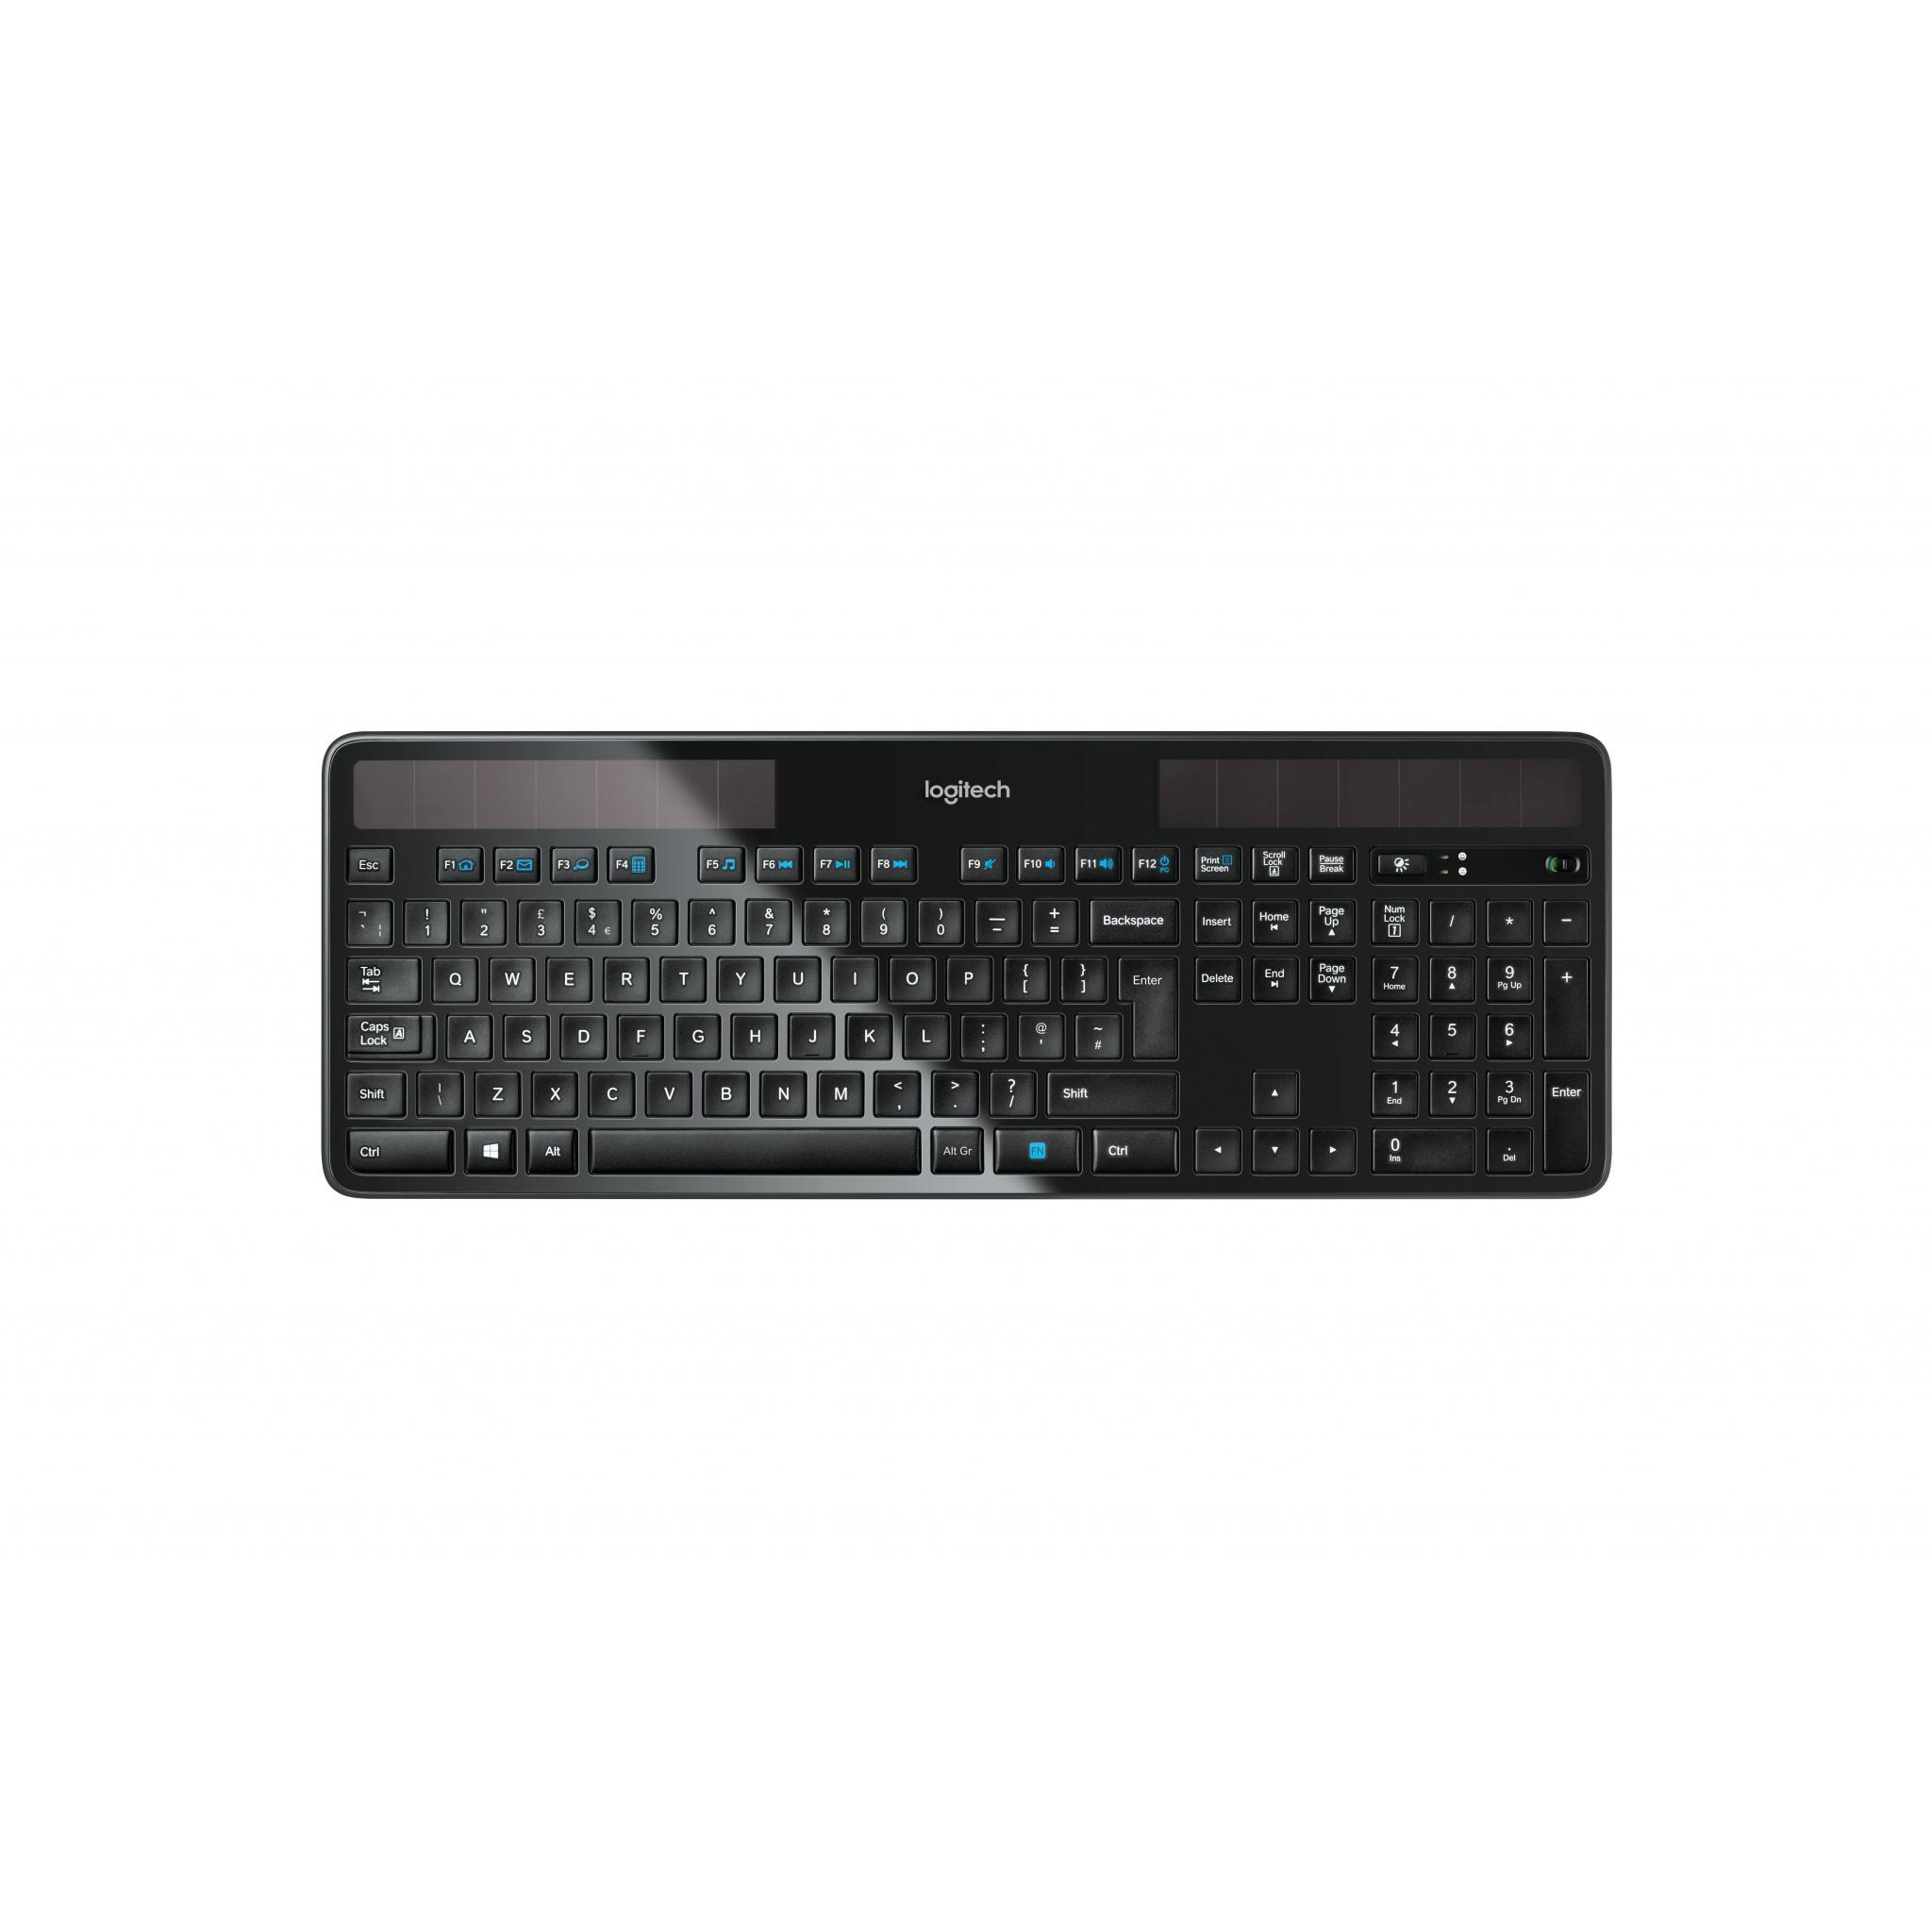 Logitech K750 Wireless Solar Keyboard - Spanish Layout QWERT